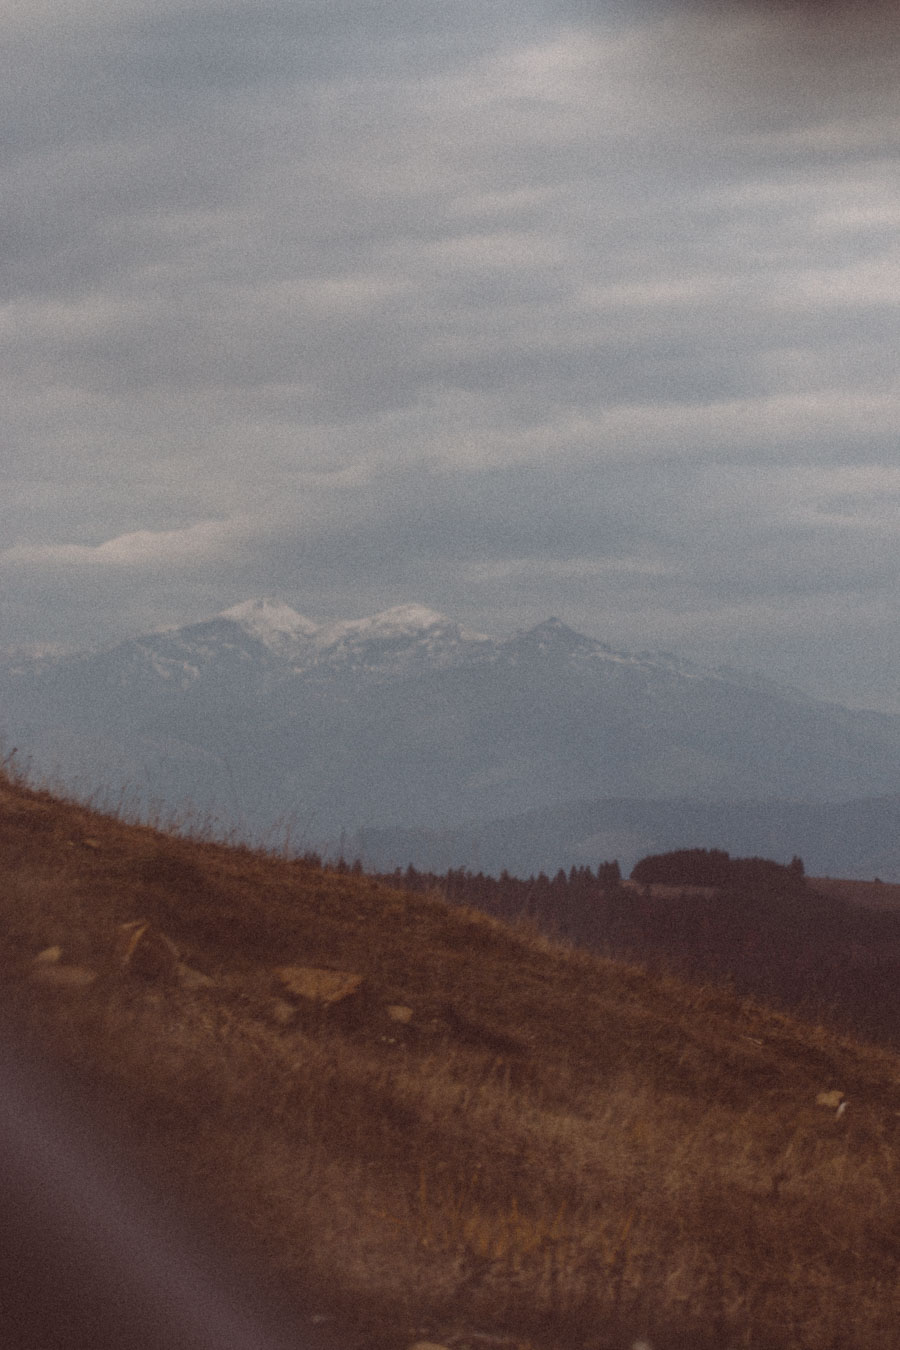 Autumn in the Romanian mountains